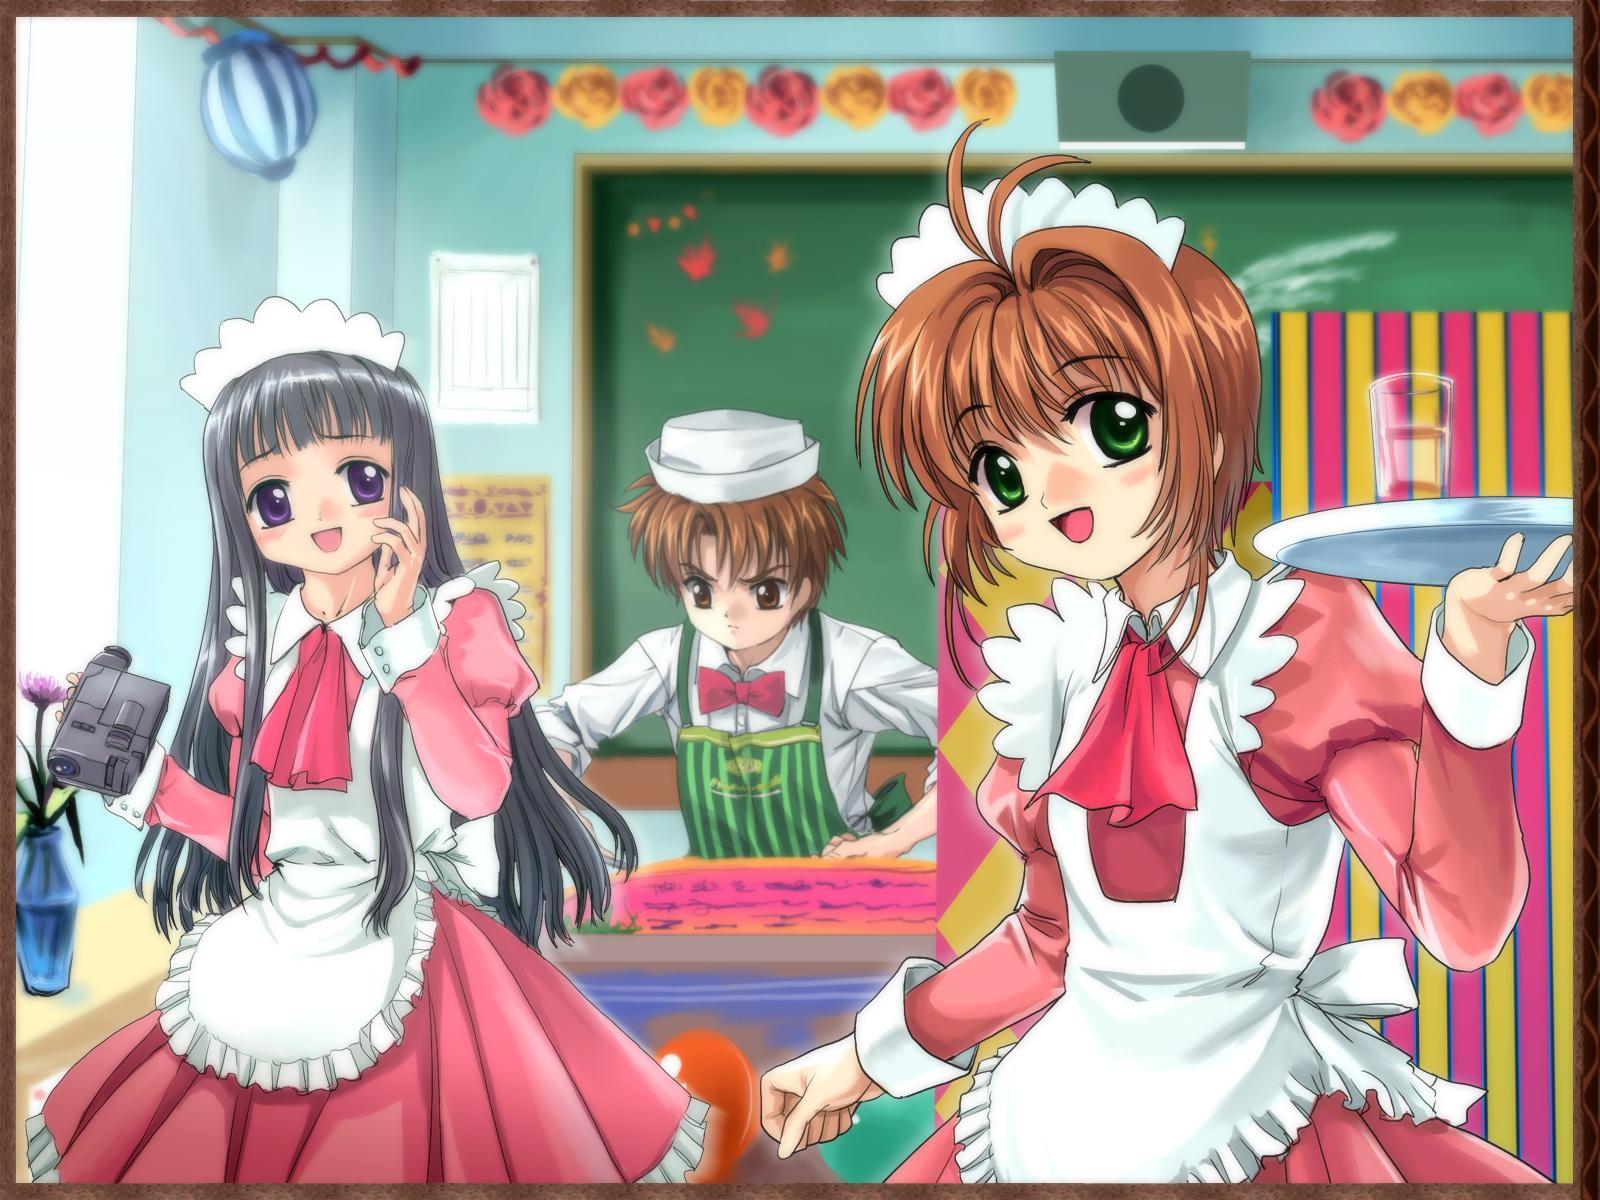 card_captor_sakura daidouji_tomoyo kinomoto_sakura li_syaoran moonknives waitress